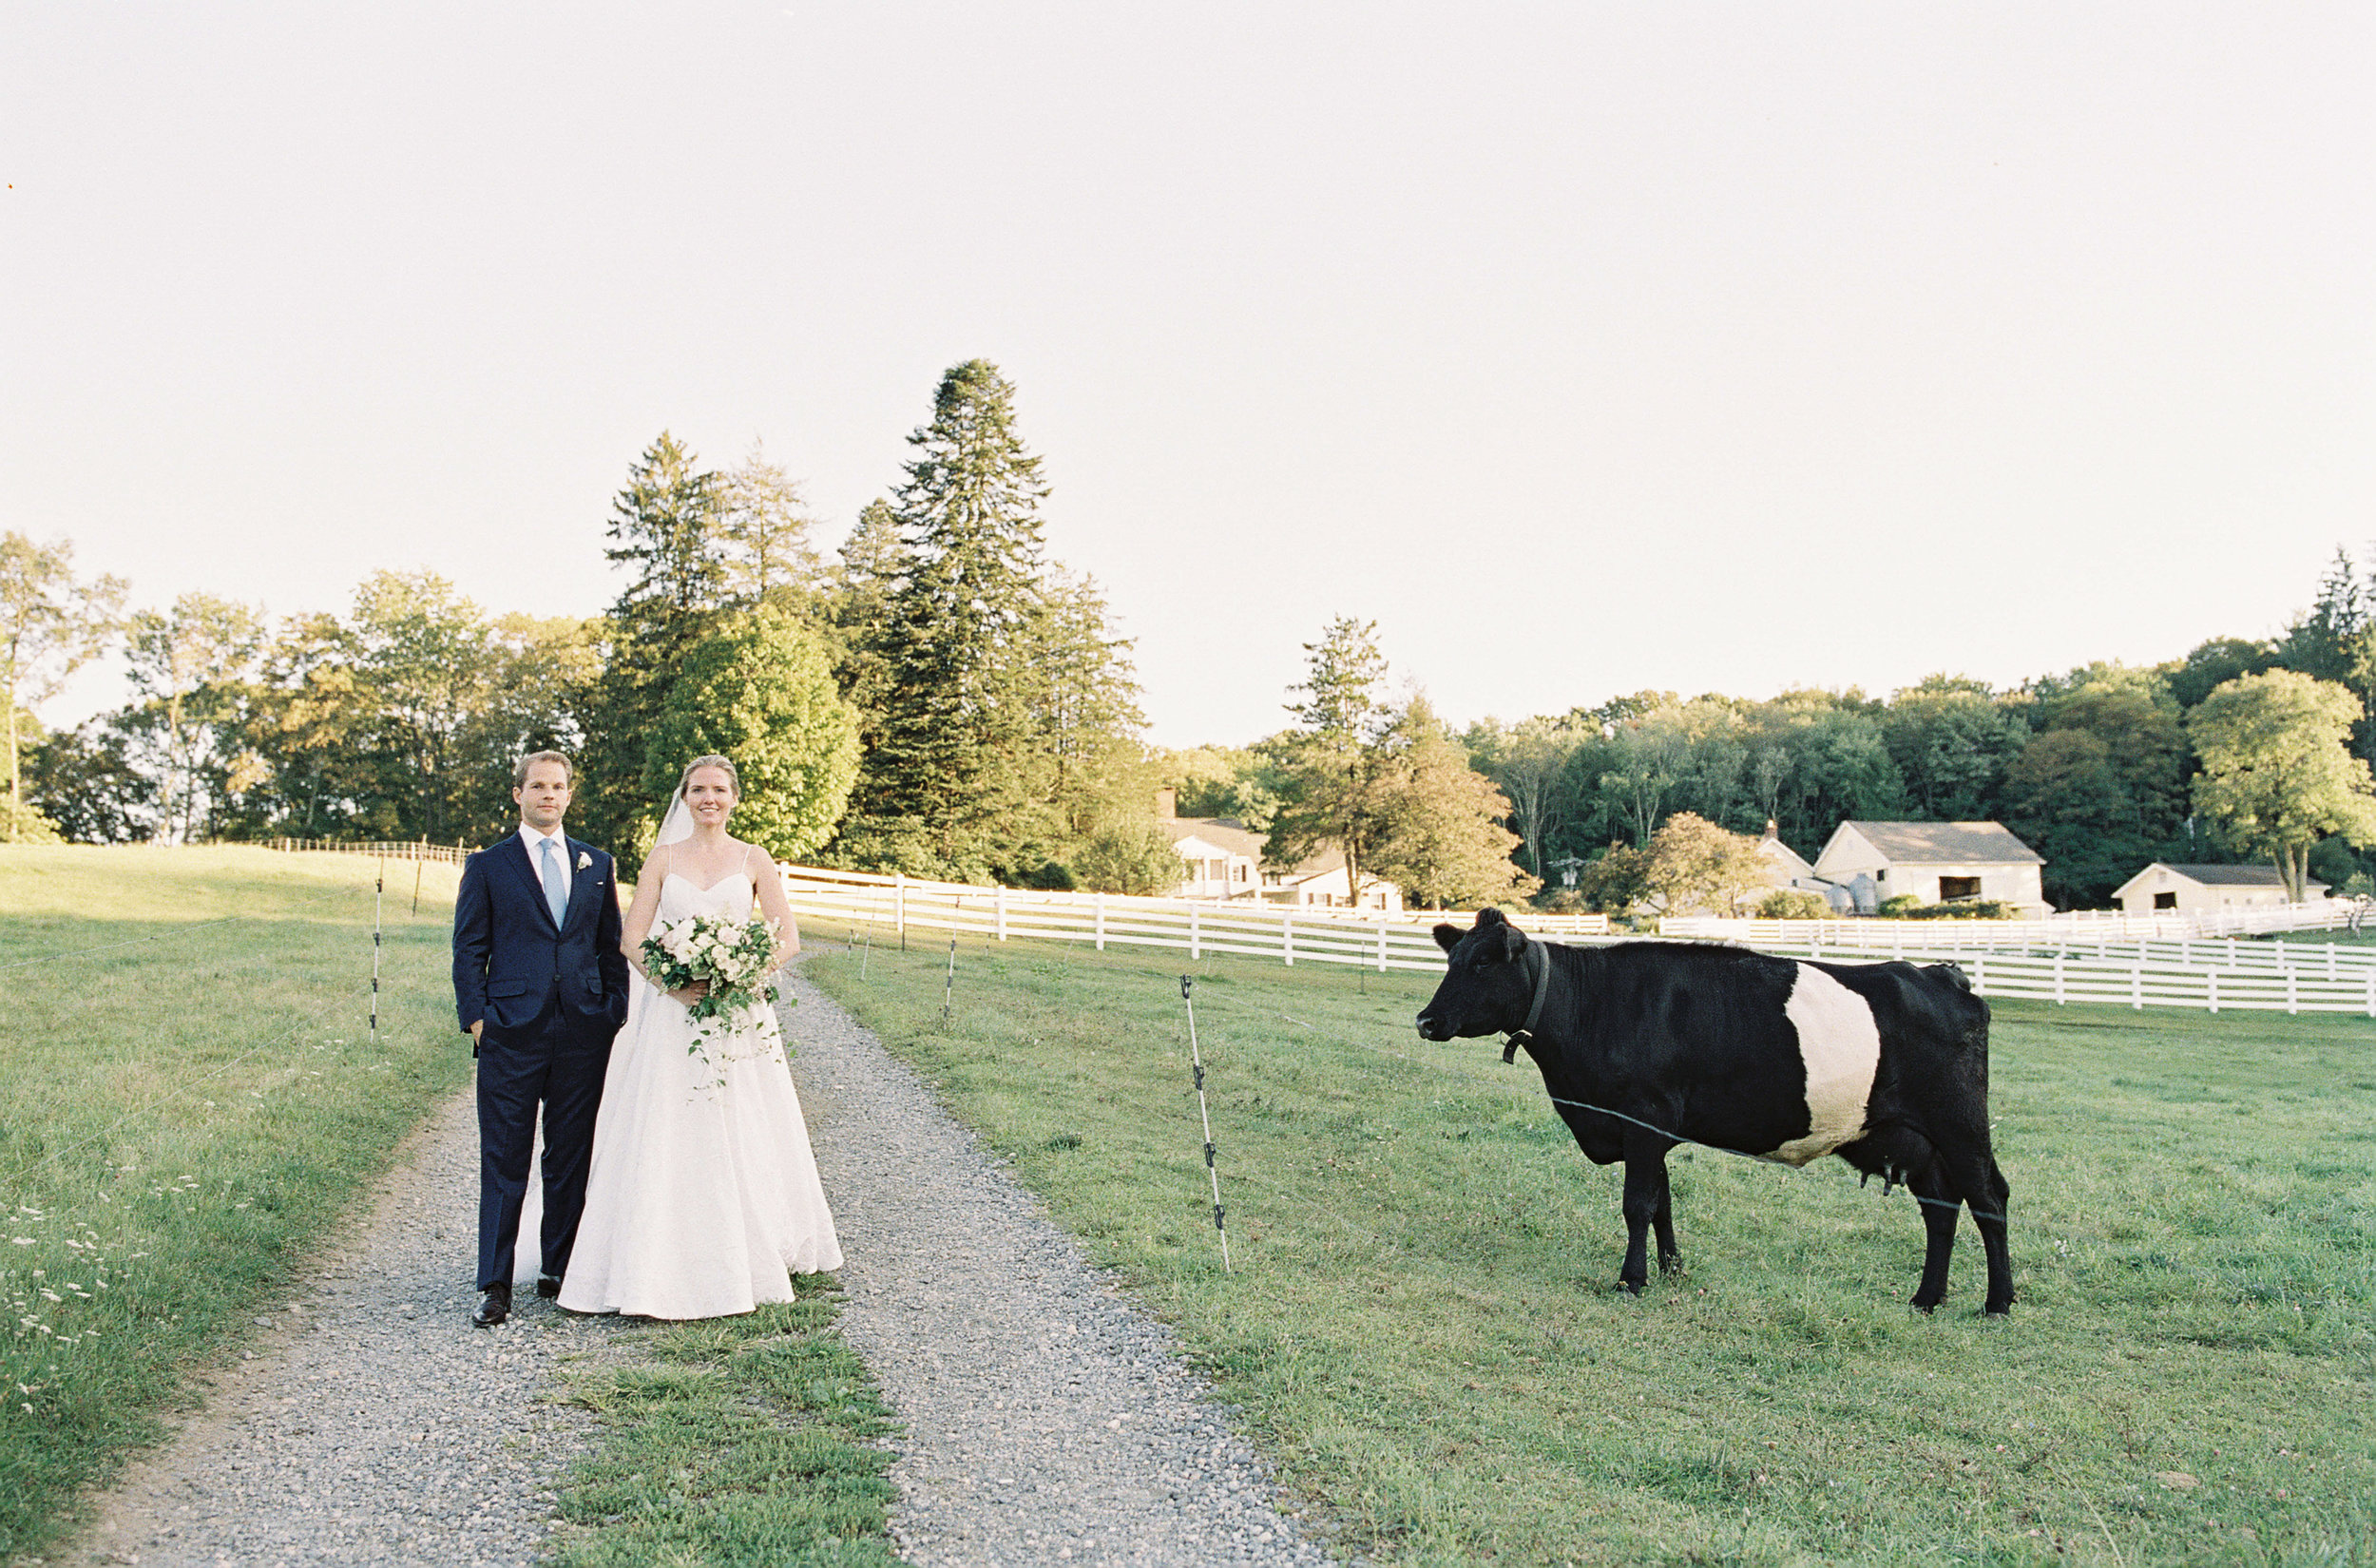 Connecticut-Wedding-35-Jen-Huang-20170909-KB-165-Jen_Huang-006796-R1-036.jpg